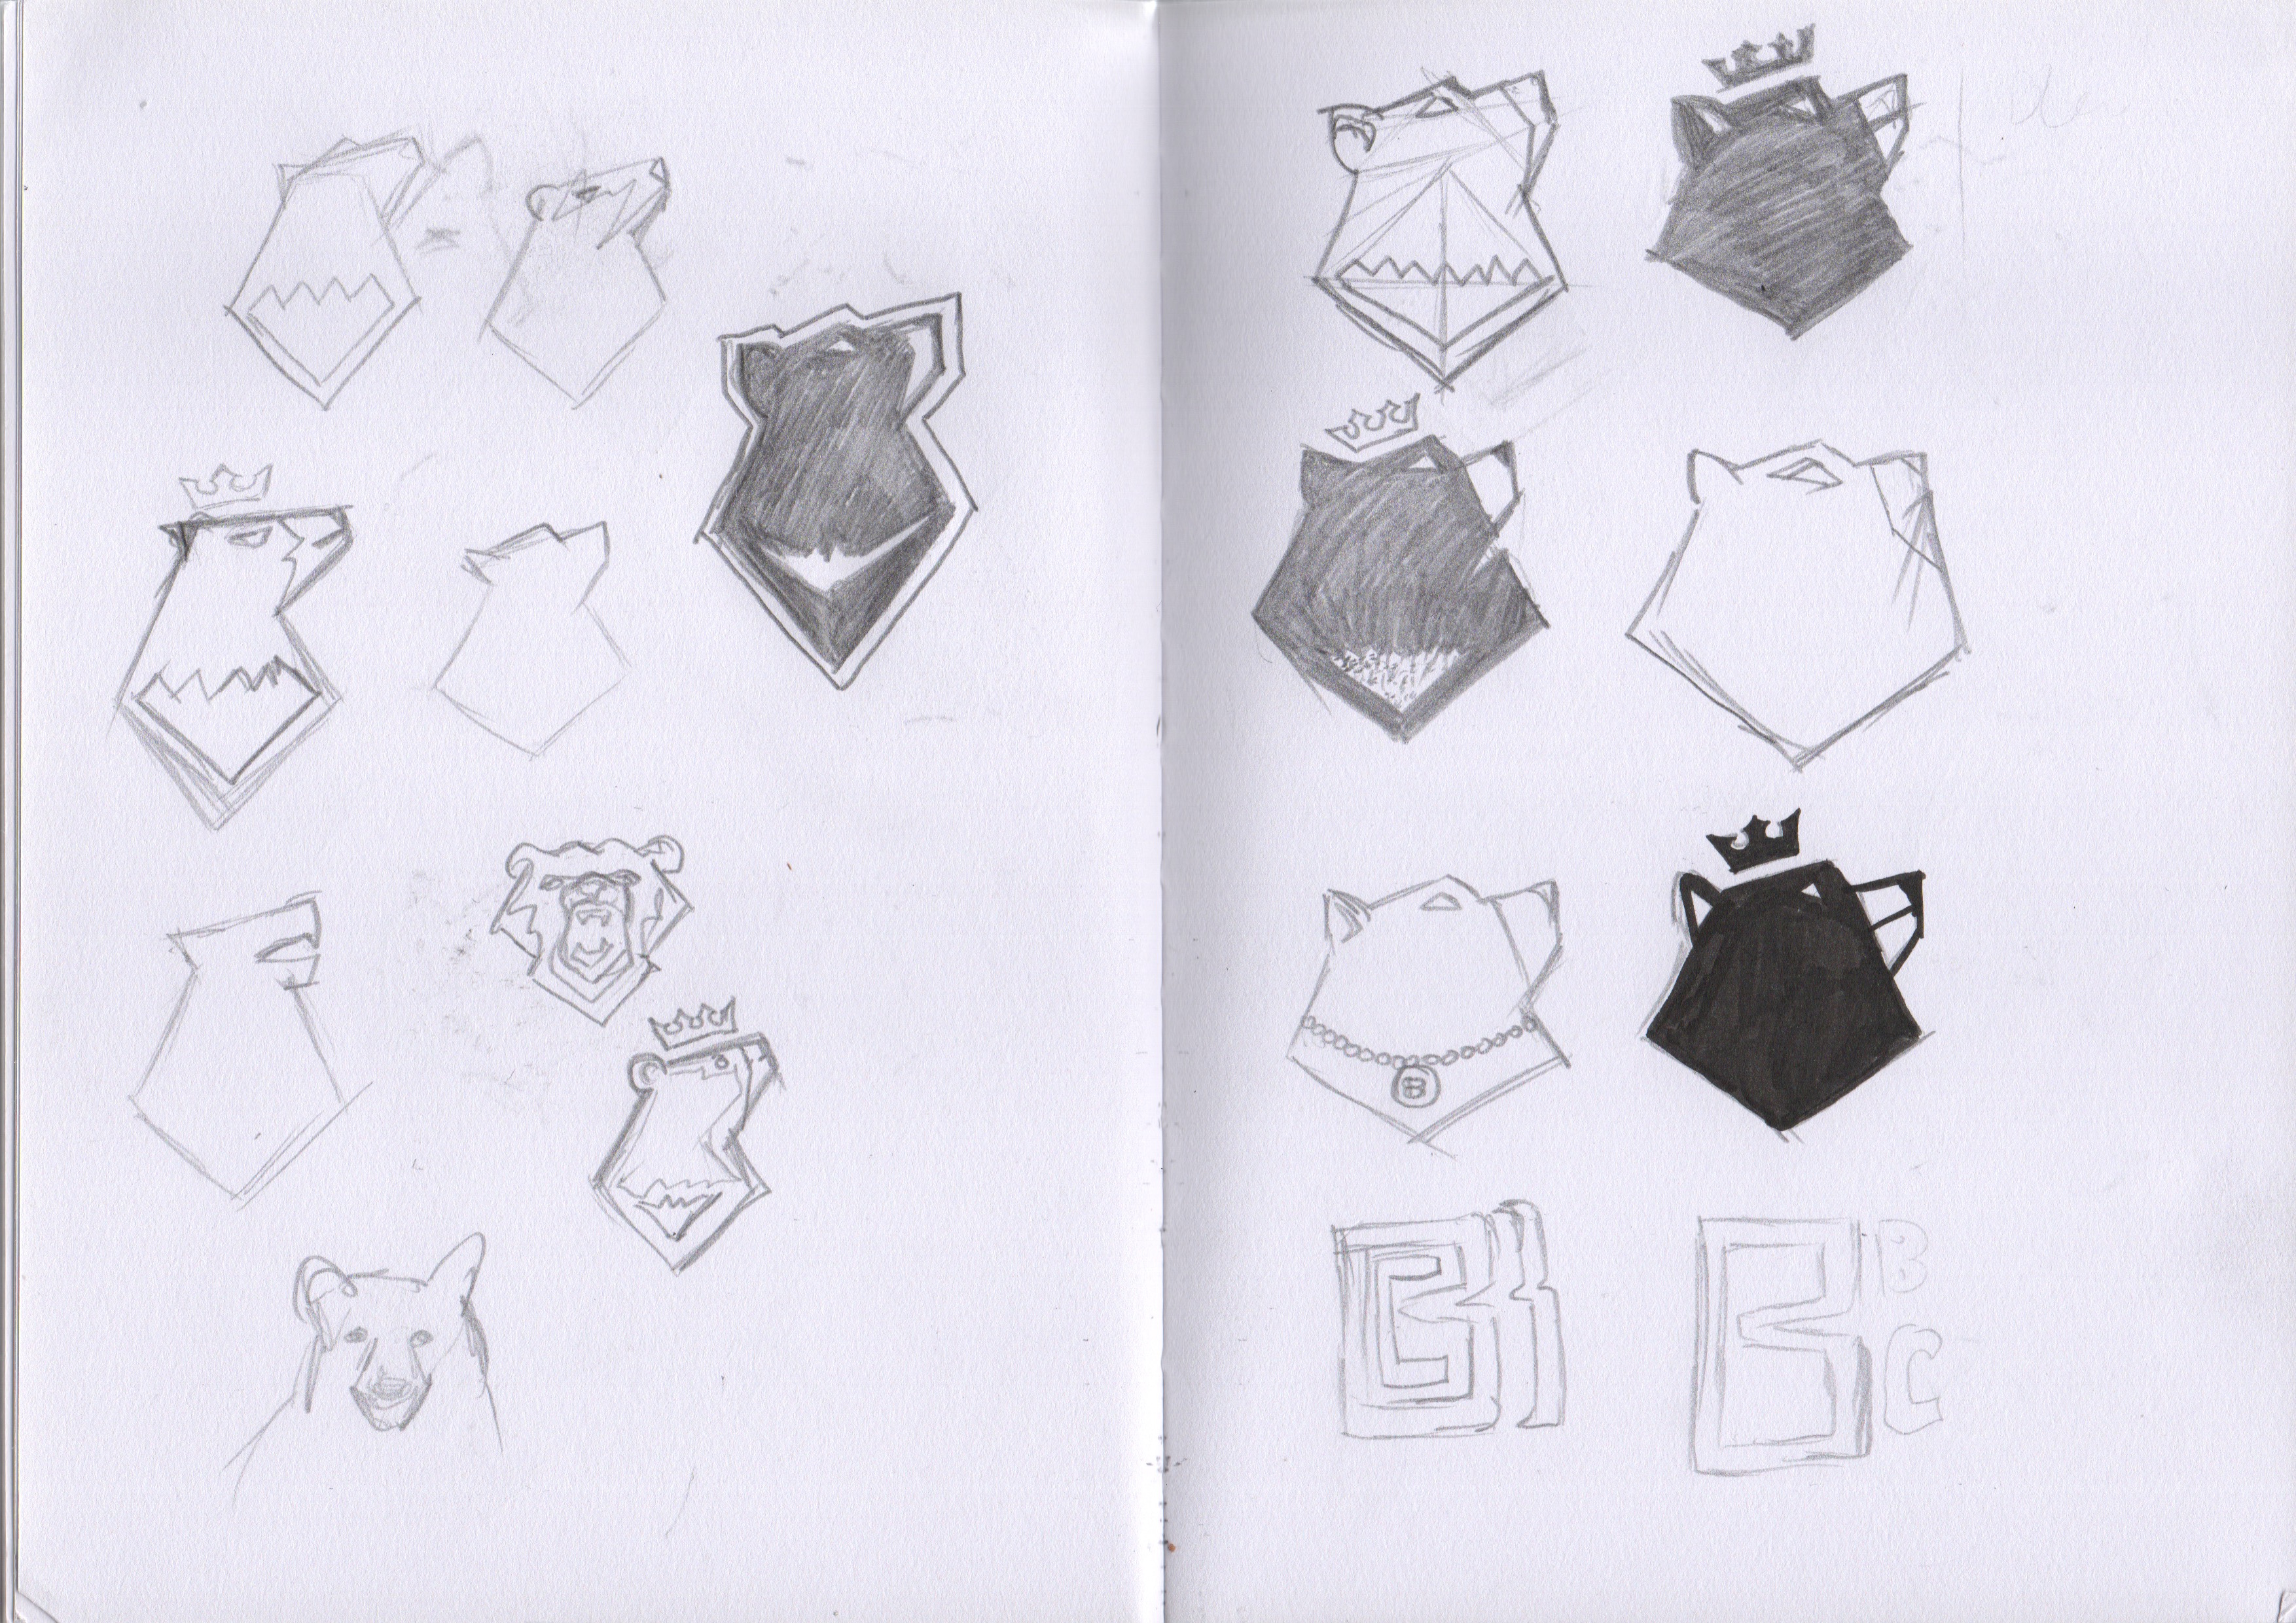 Initial Black Bear Concept Sketchs